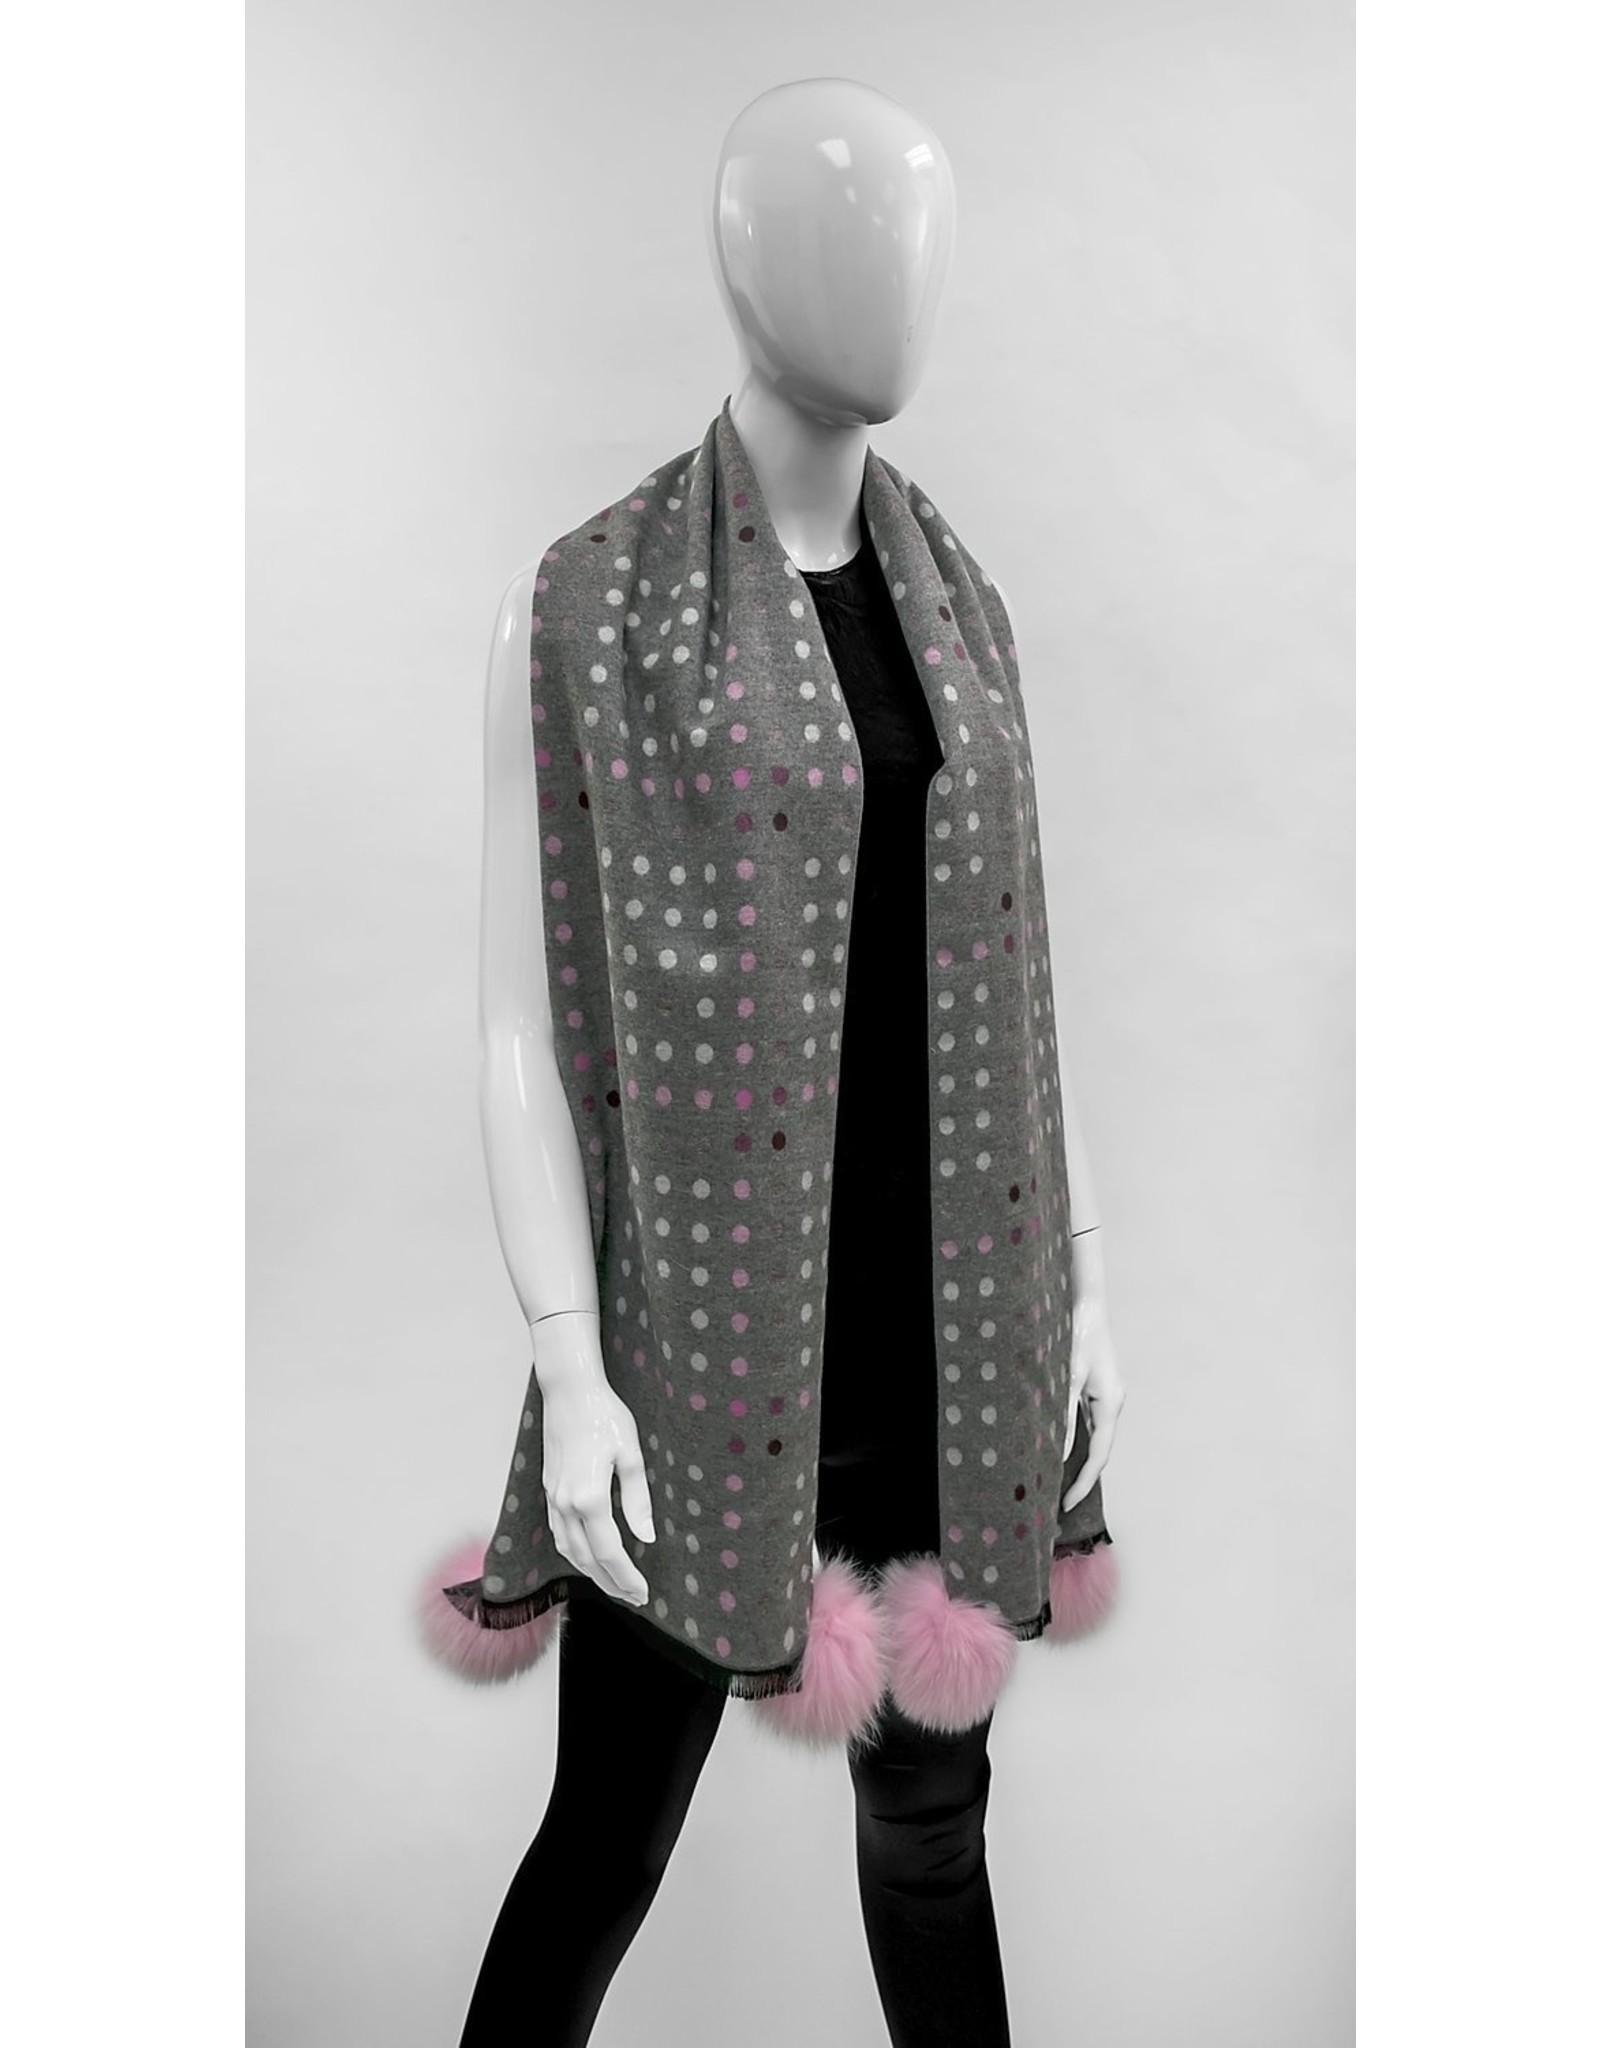 Polka Dot Scarf Grey and Pink - SC0737